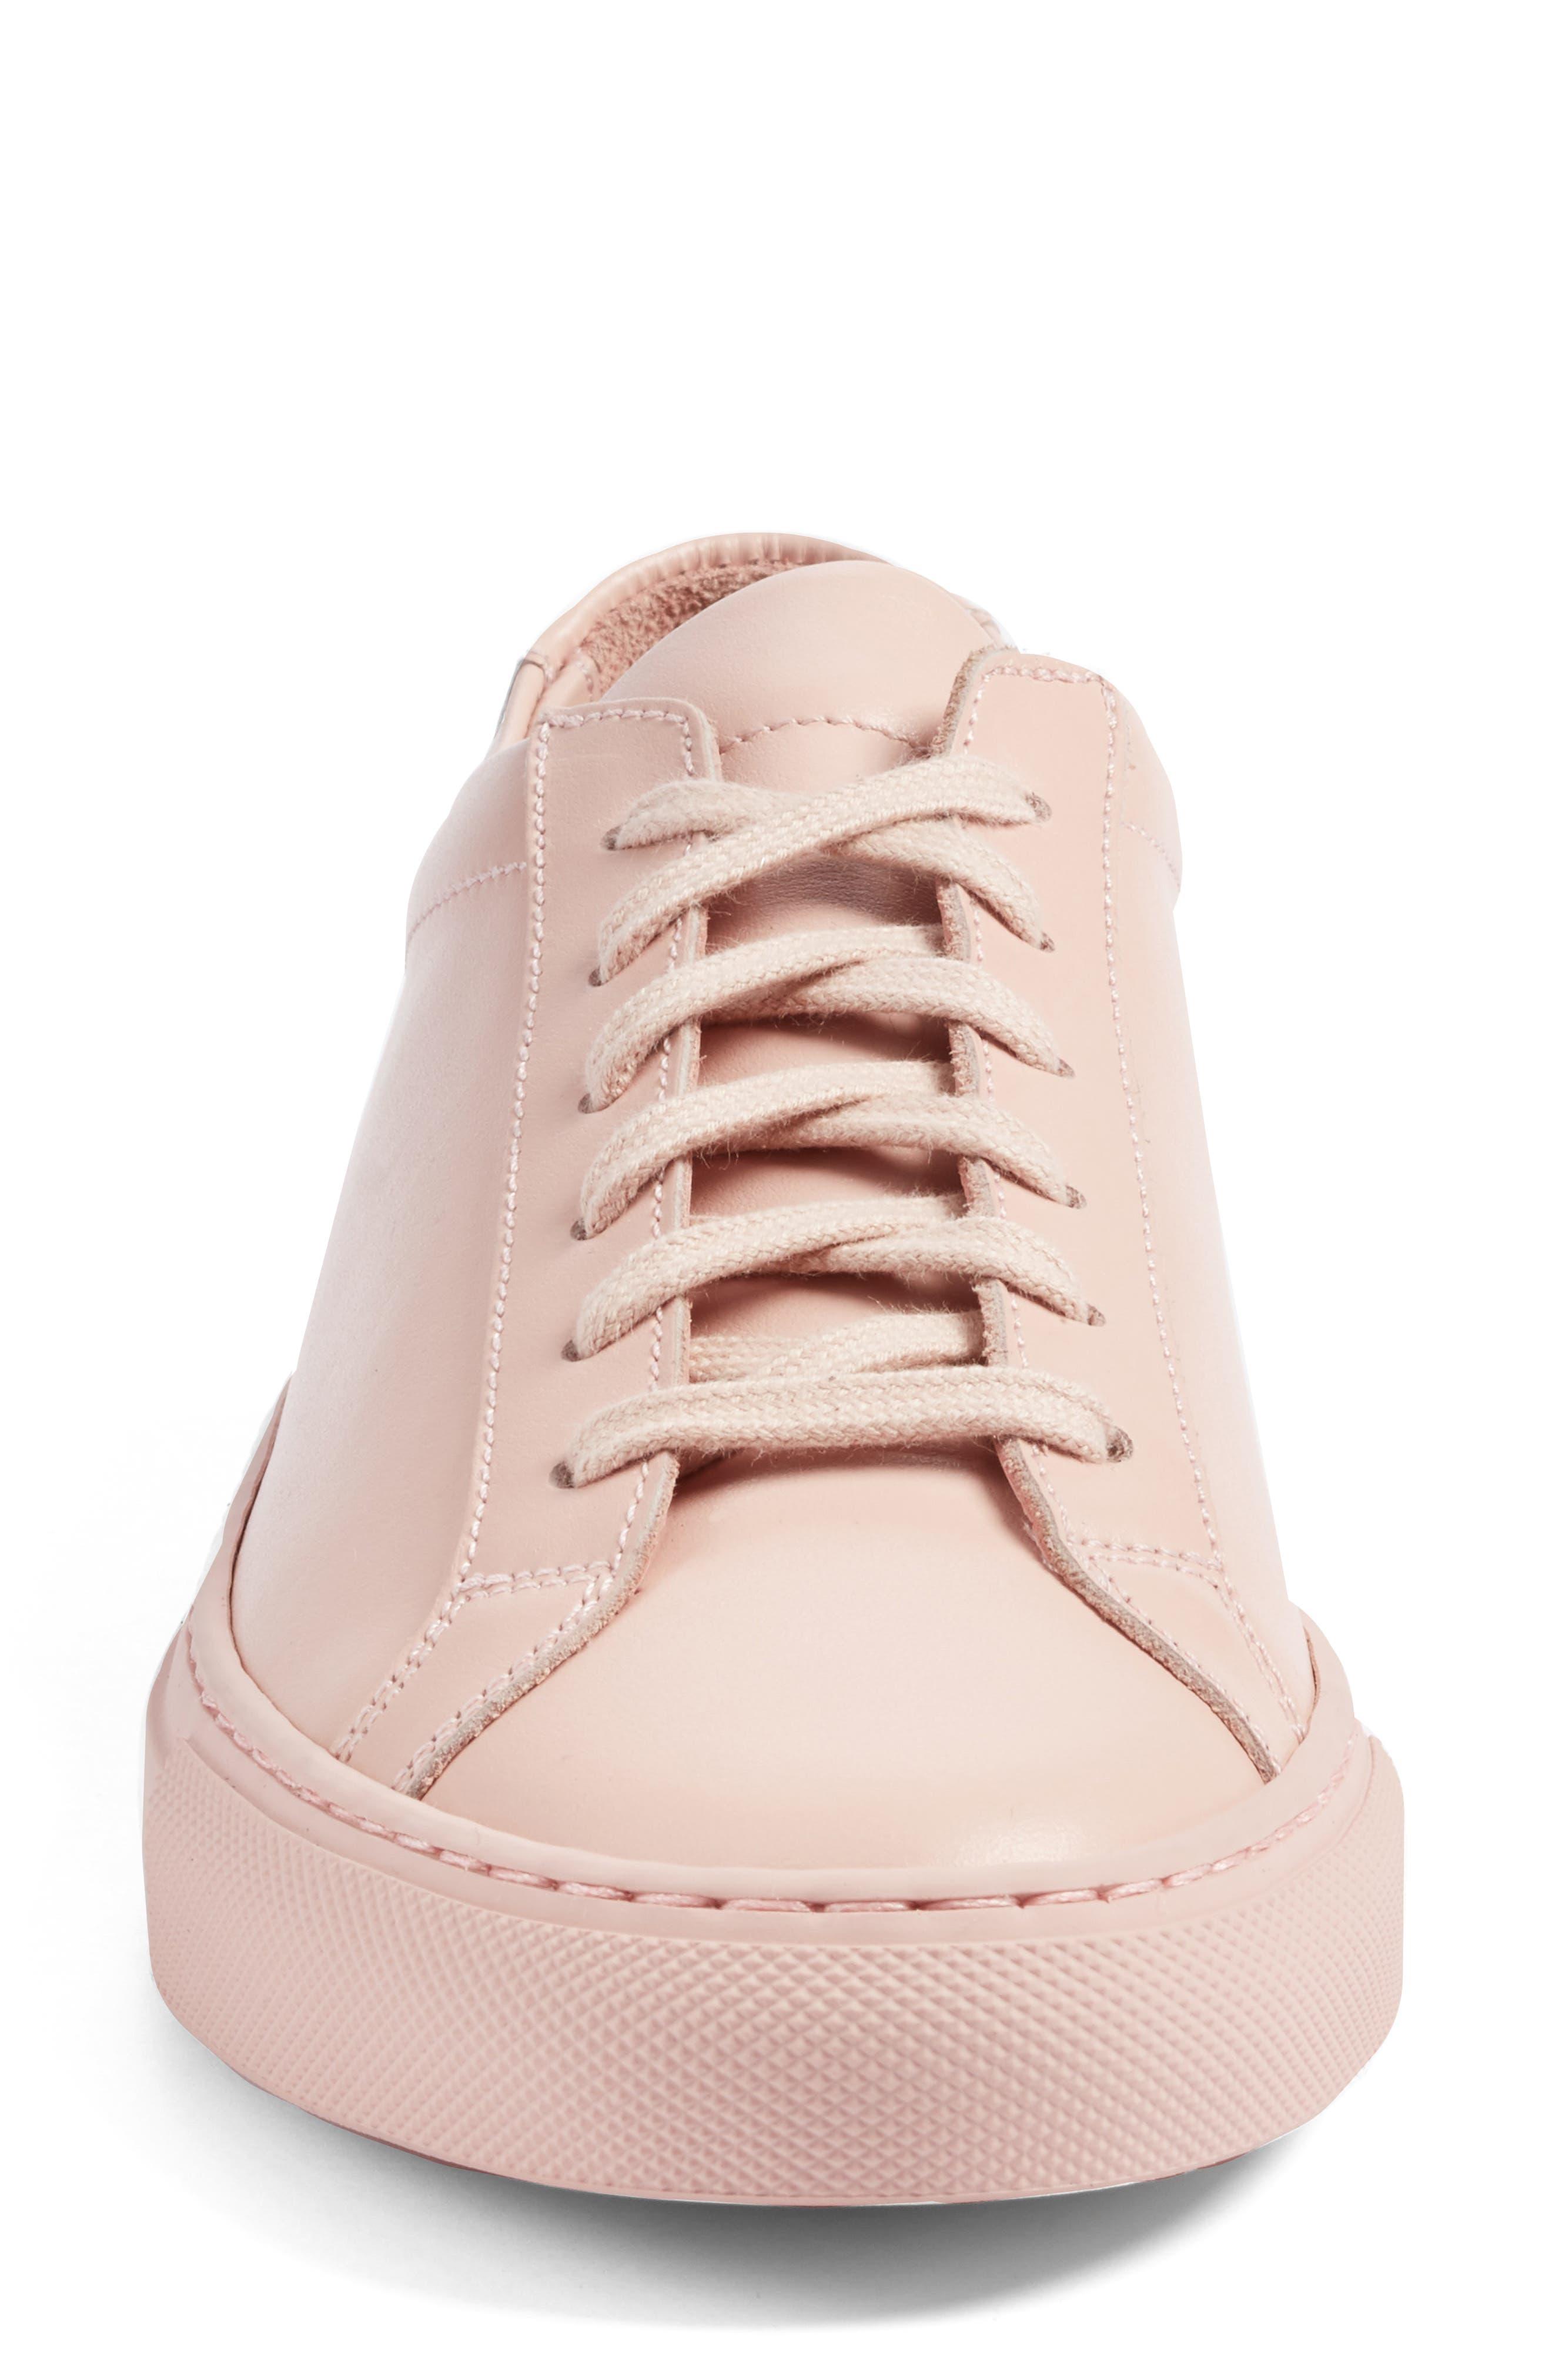 Original Achilles Sneaker,                             Alternate thumbnail 4, color,                             Blush Leather